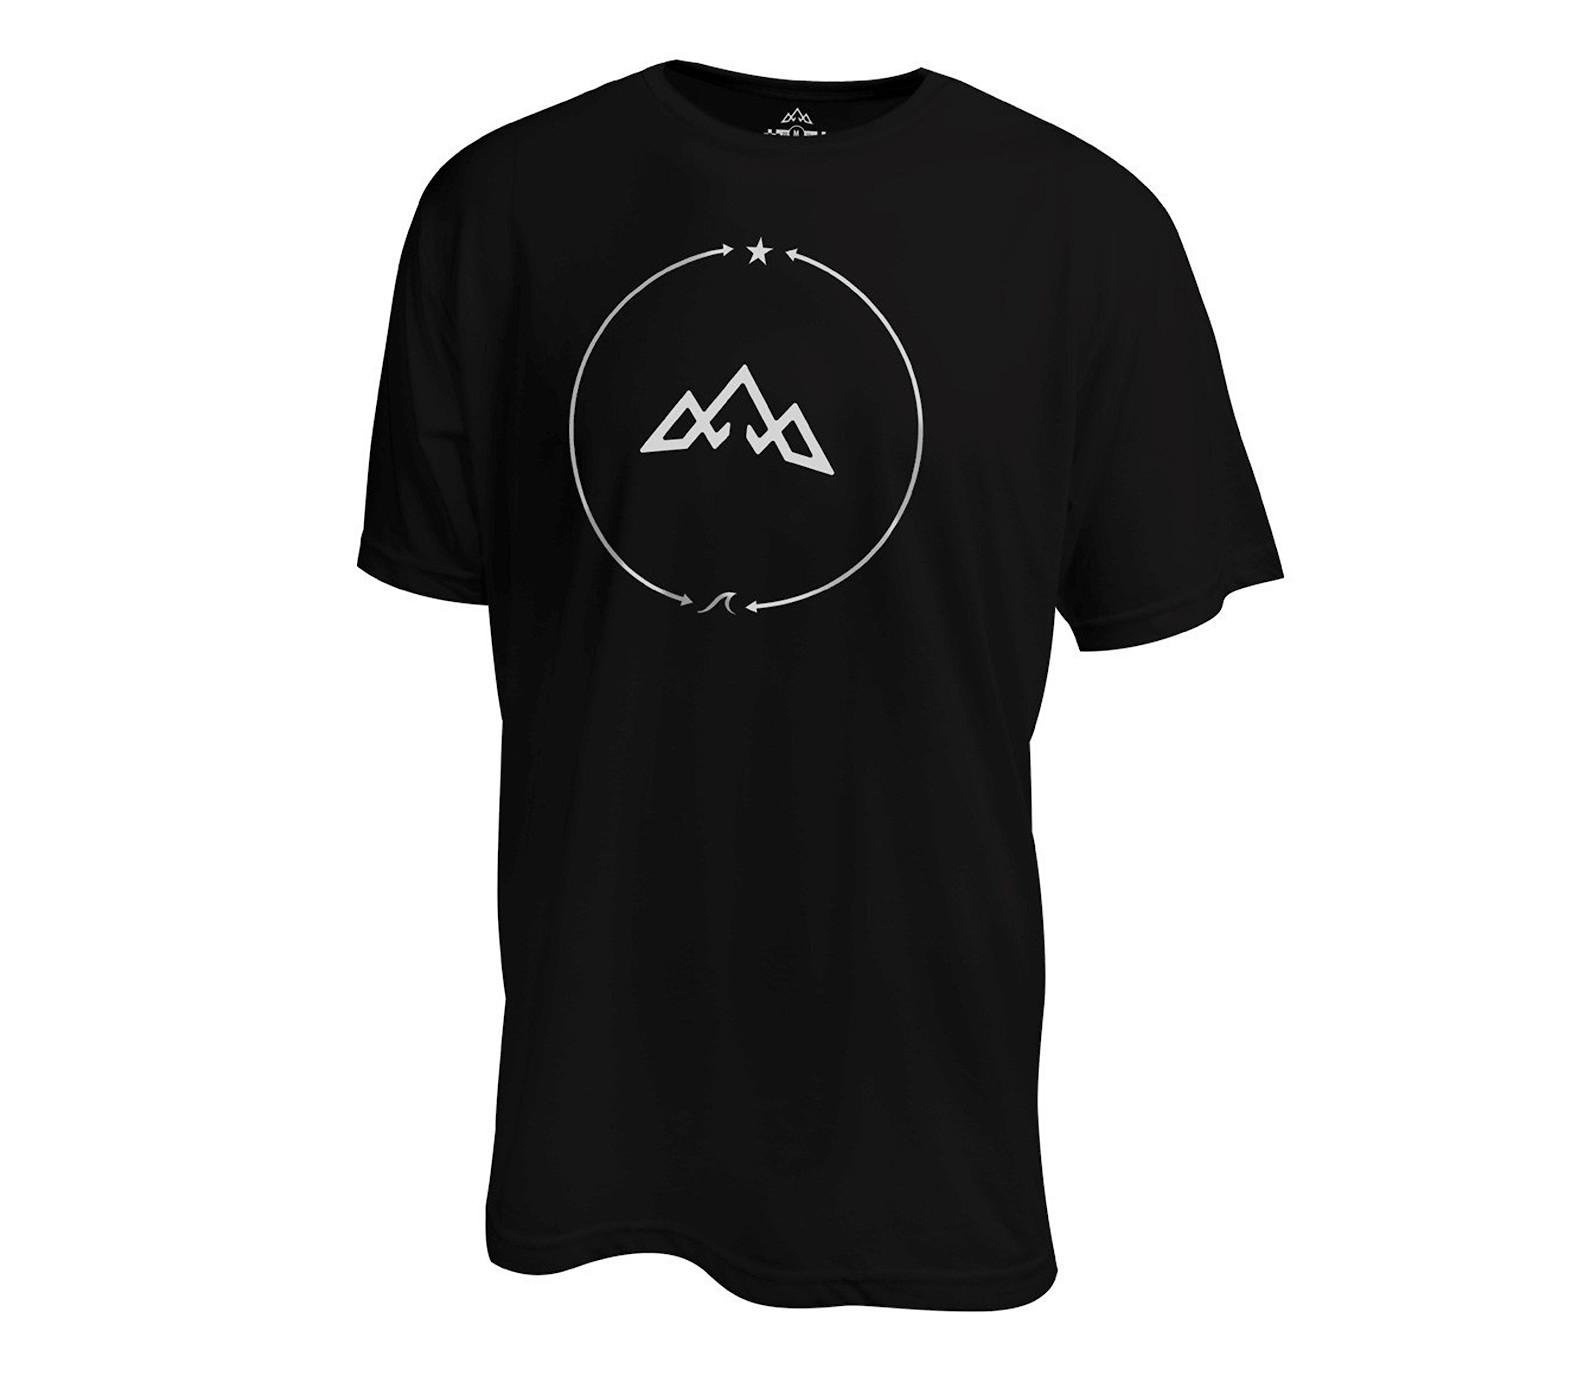 TASCO Sessions Bipolar Ride T-Shirt - Sea 2 Sky Black